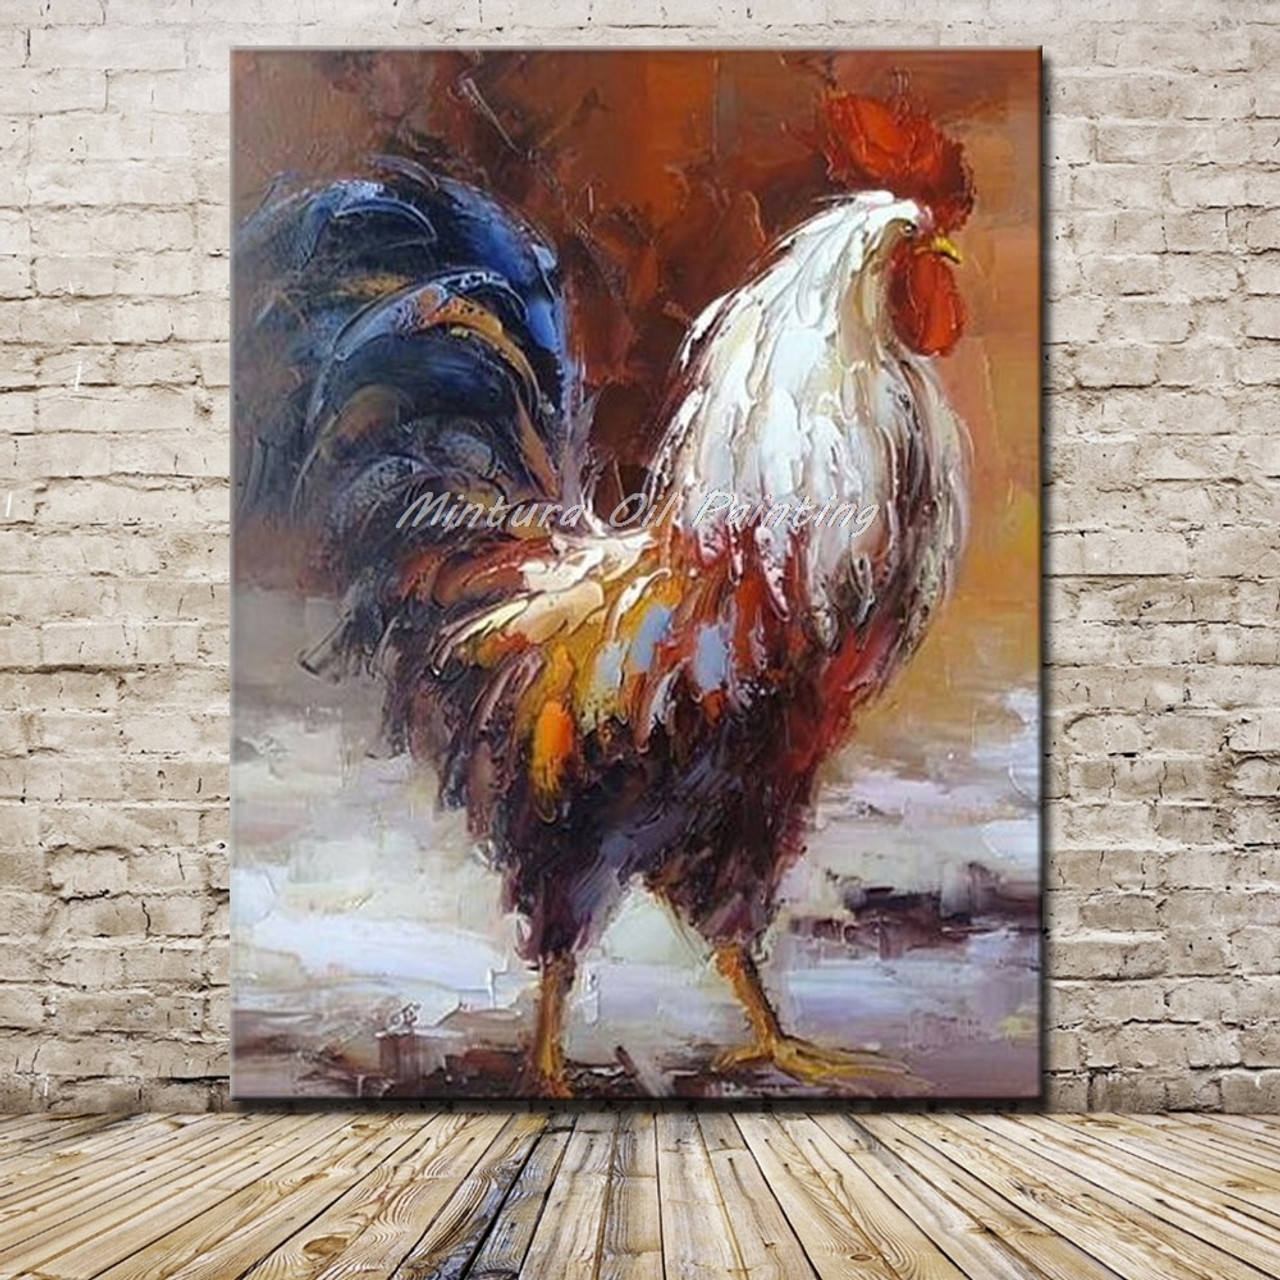 ec0e30c946 Mintura Art Hand Painted Cock Animal Oil Painting On Canvas Pop Art Modern  Abstract Wall Art ...